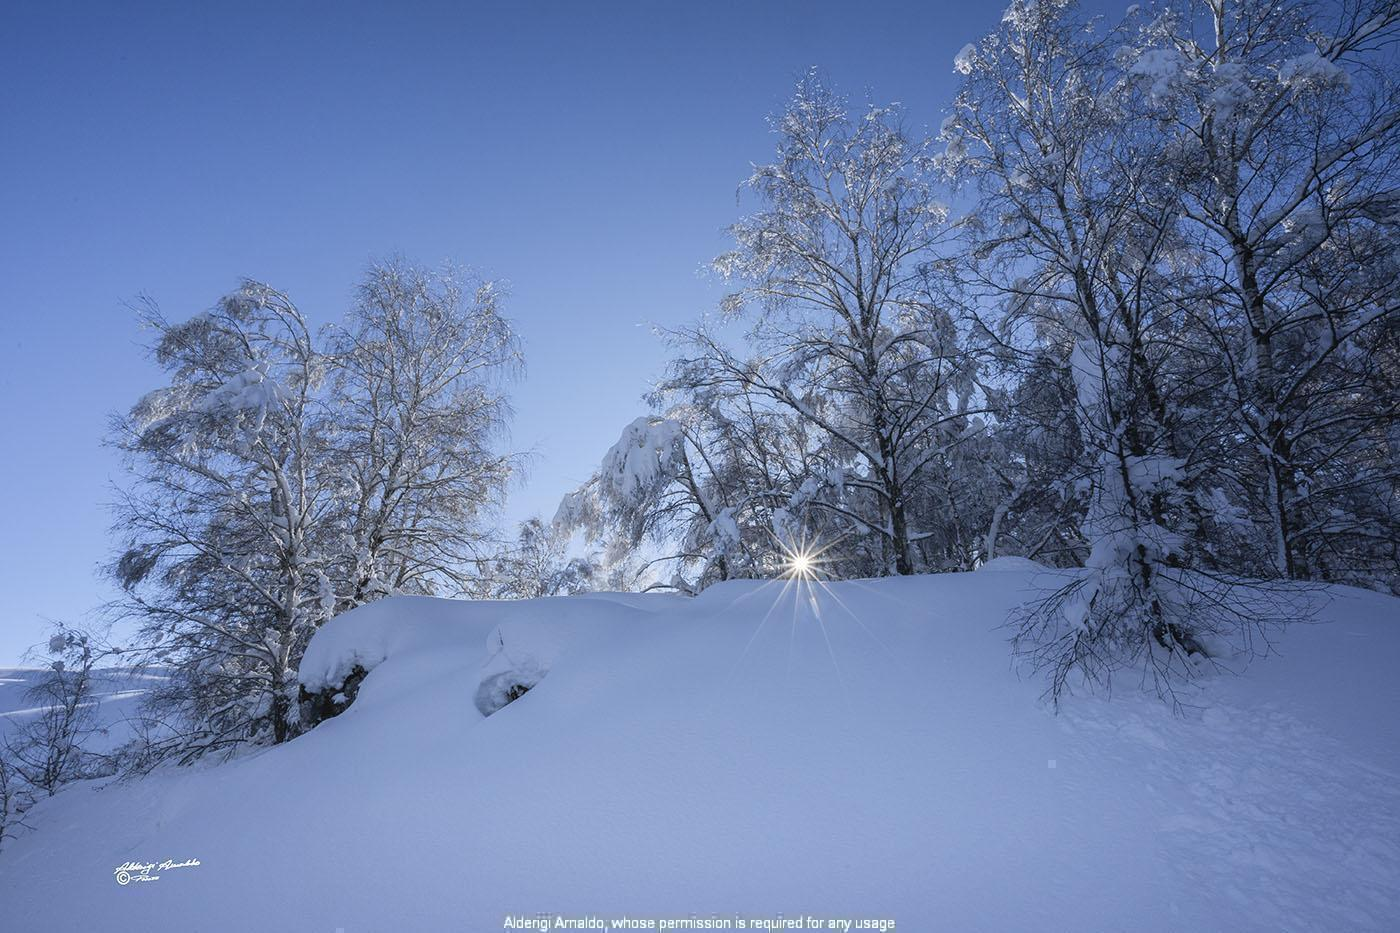 Alderigi Arnaldo Fotografo - LANDSCAPES IN THE SNOW - Photo Gallery